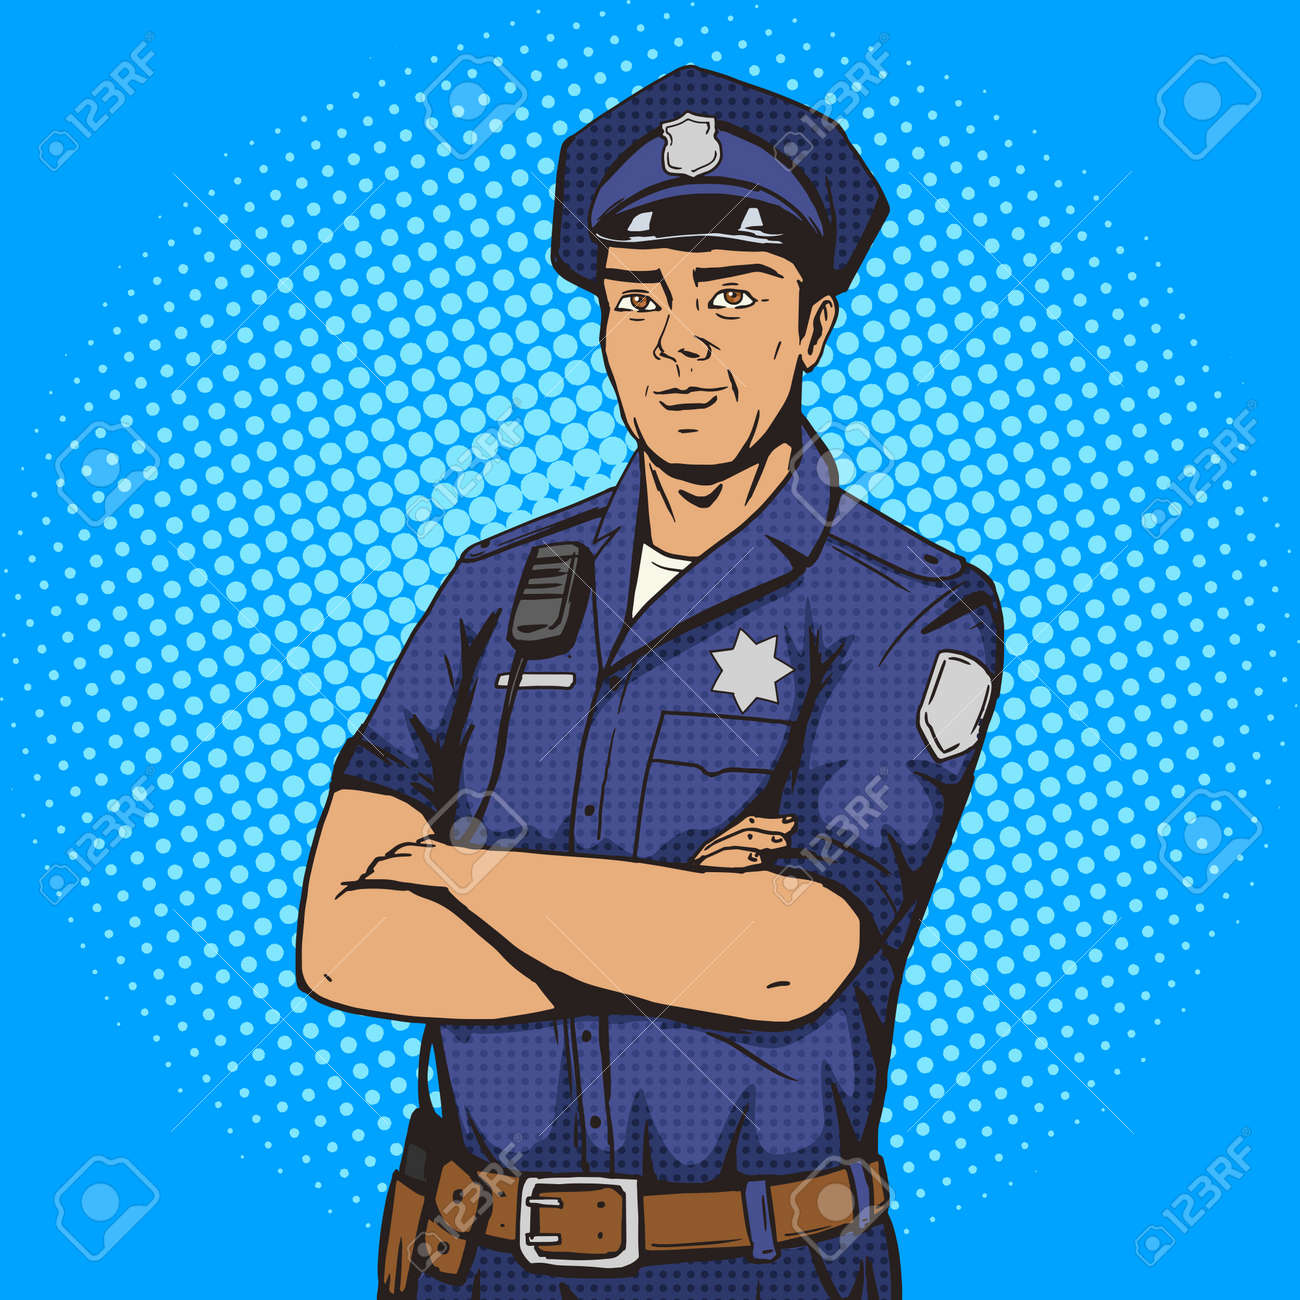 Policeman pop art style vector illustration. Police officer. Comic book style imitation. Vintage retro style. Conceptual illustration - 52219211